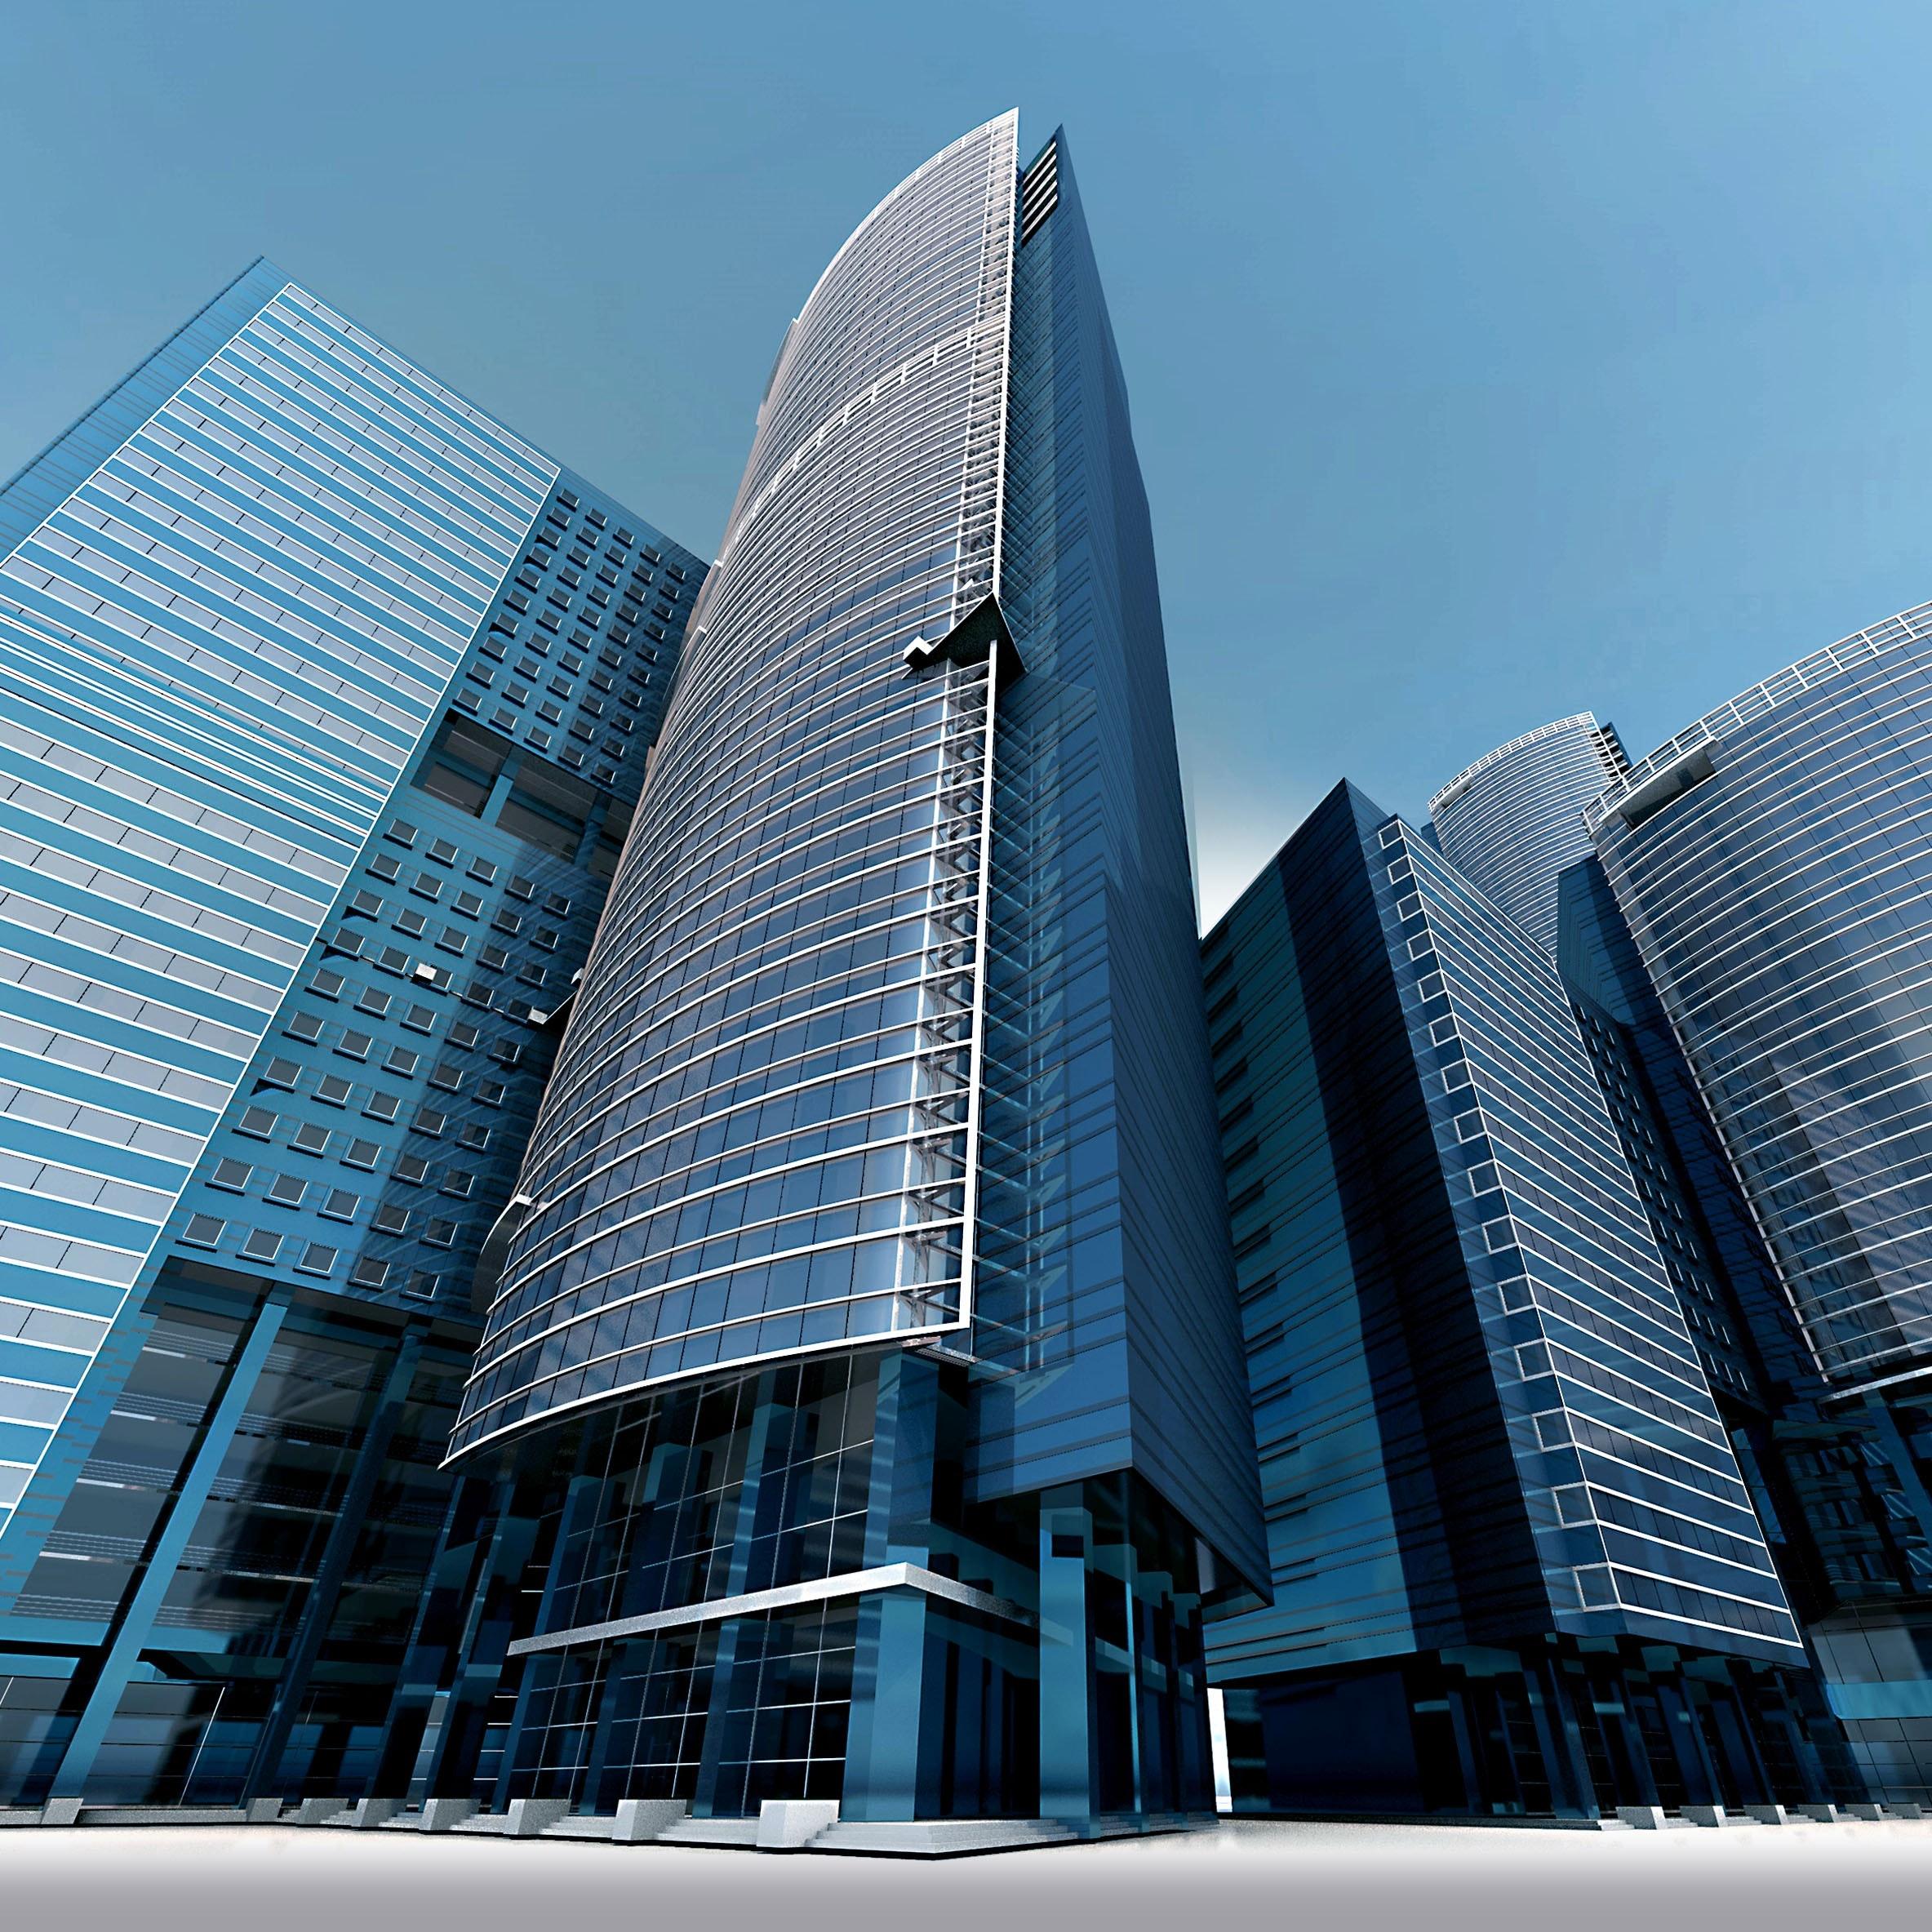 pexels-pixabay-290275 - Class AA Office Towers - Urban